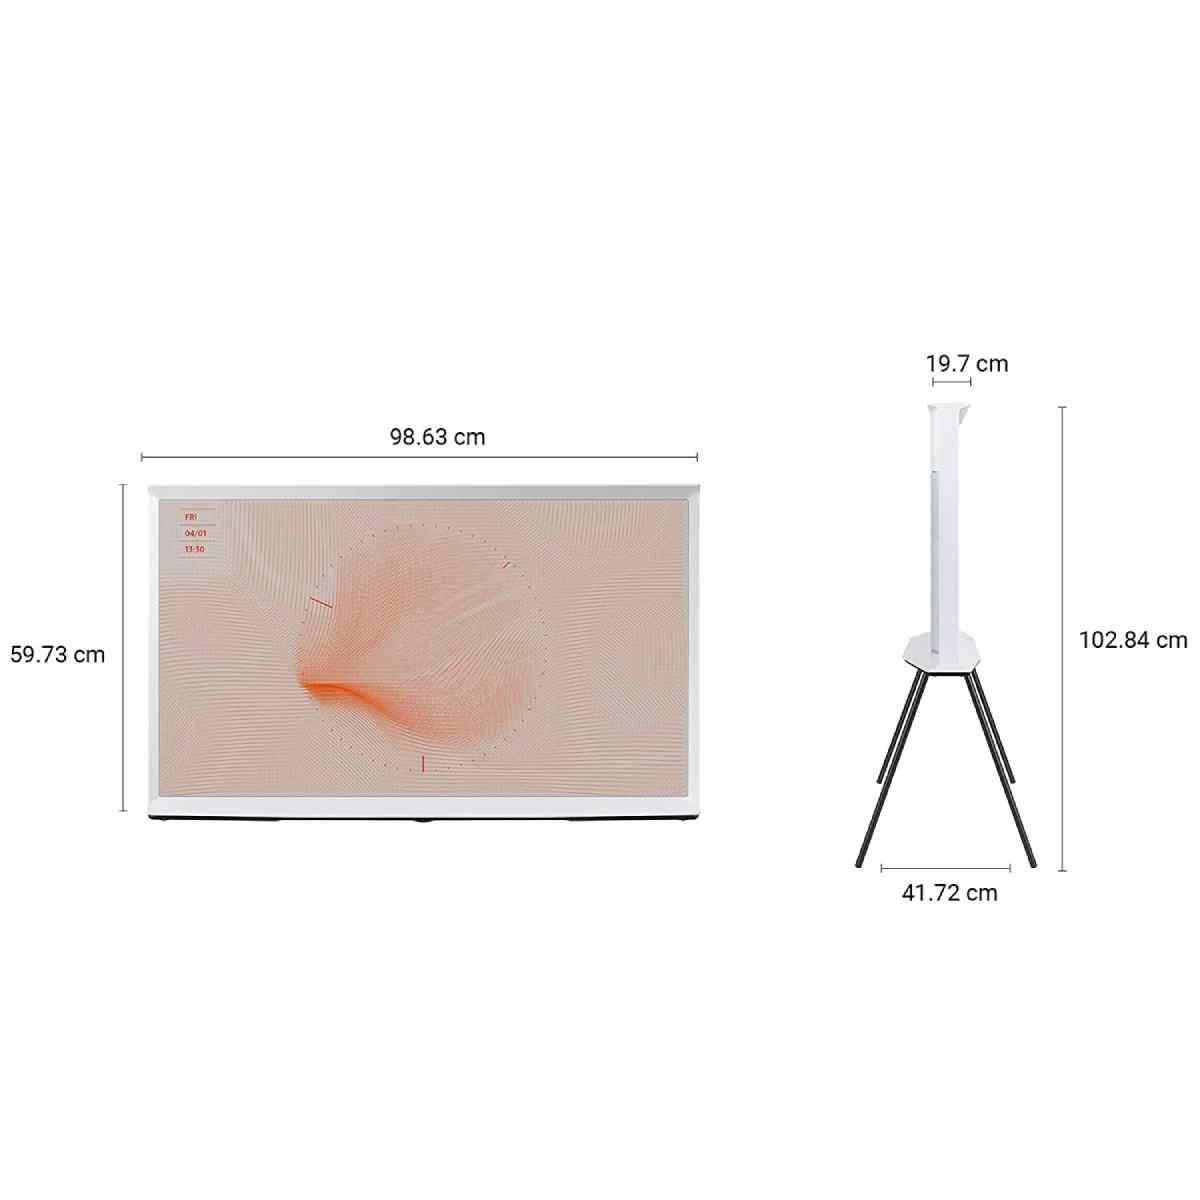 सैमसंग The Serif Series 43 इंच 4K Ultra HD Smart QLED टीवी (QA43LS01TAKXXL)